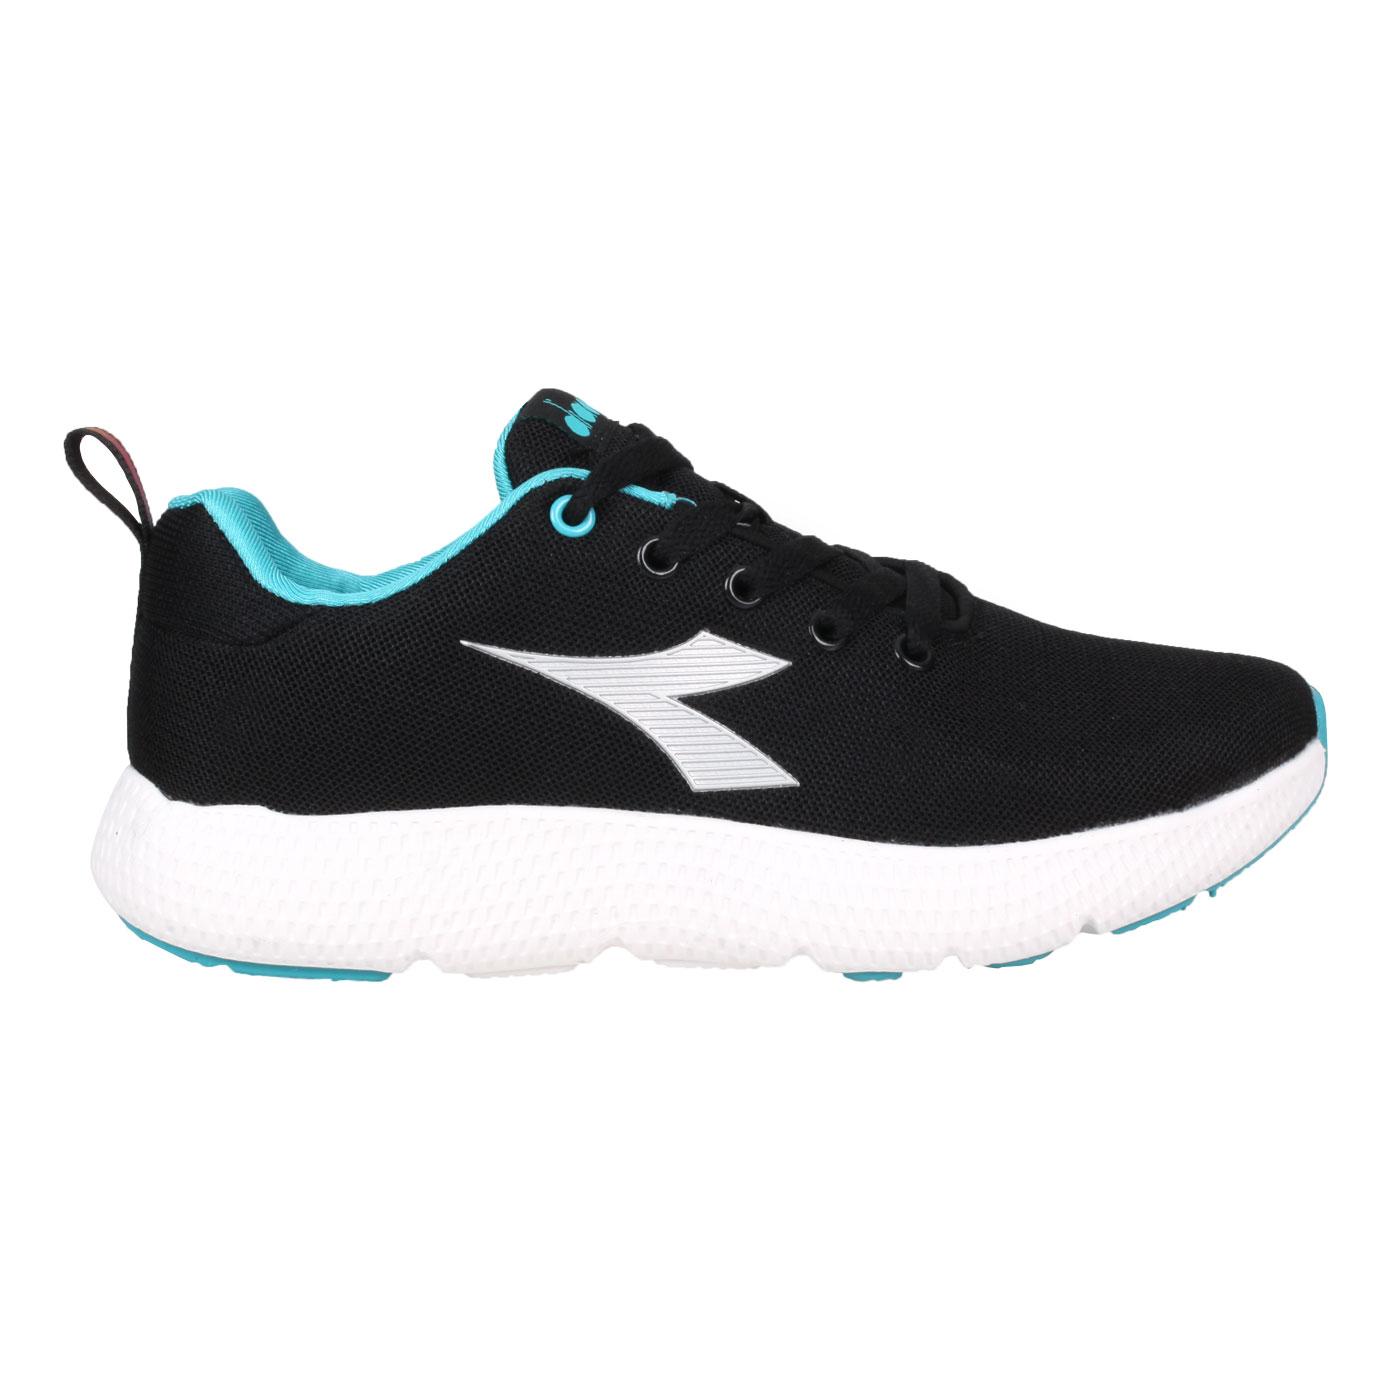 DIADORA 女款專業輕量慢跑鞋 DA31658 - 黑水藍